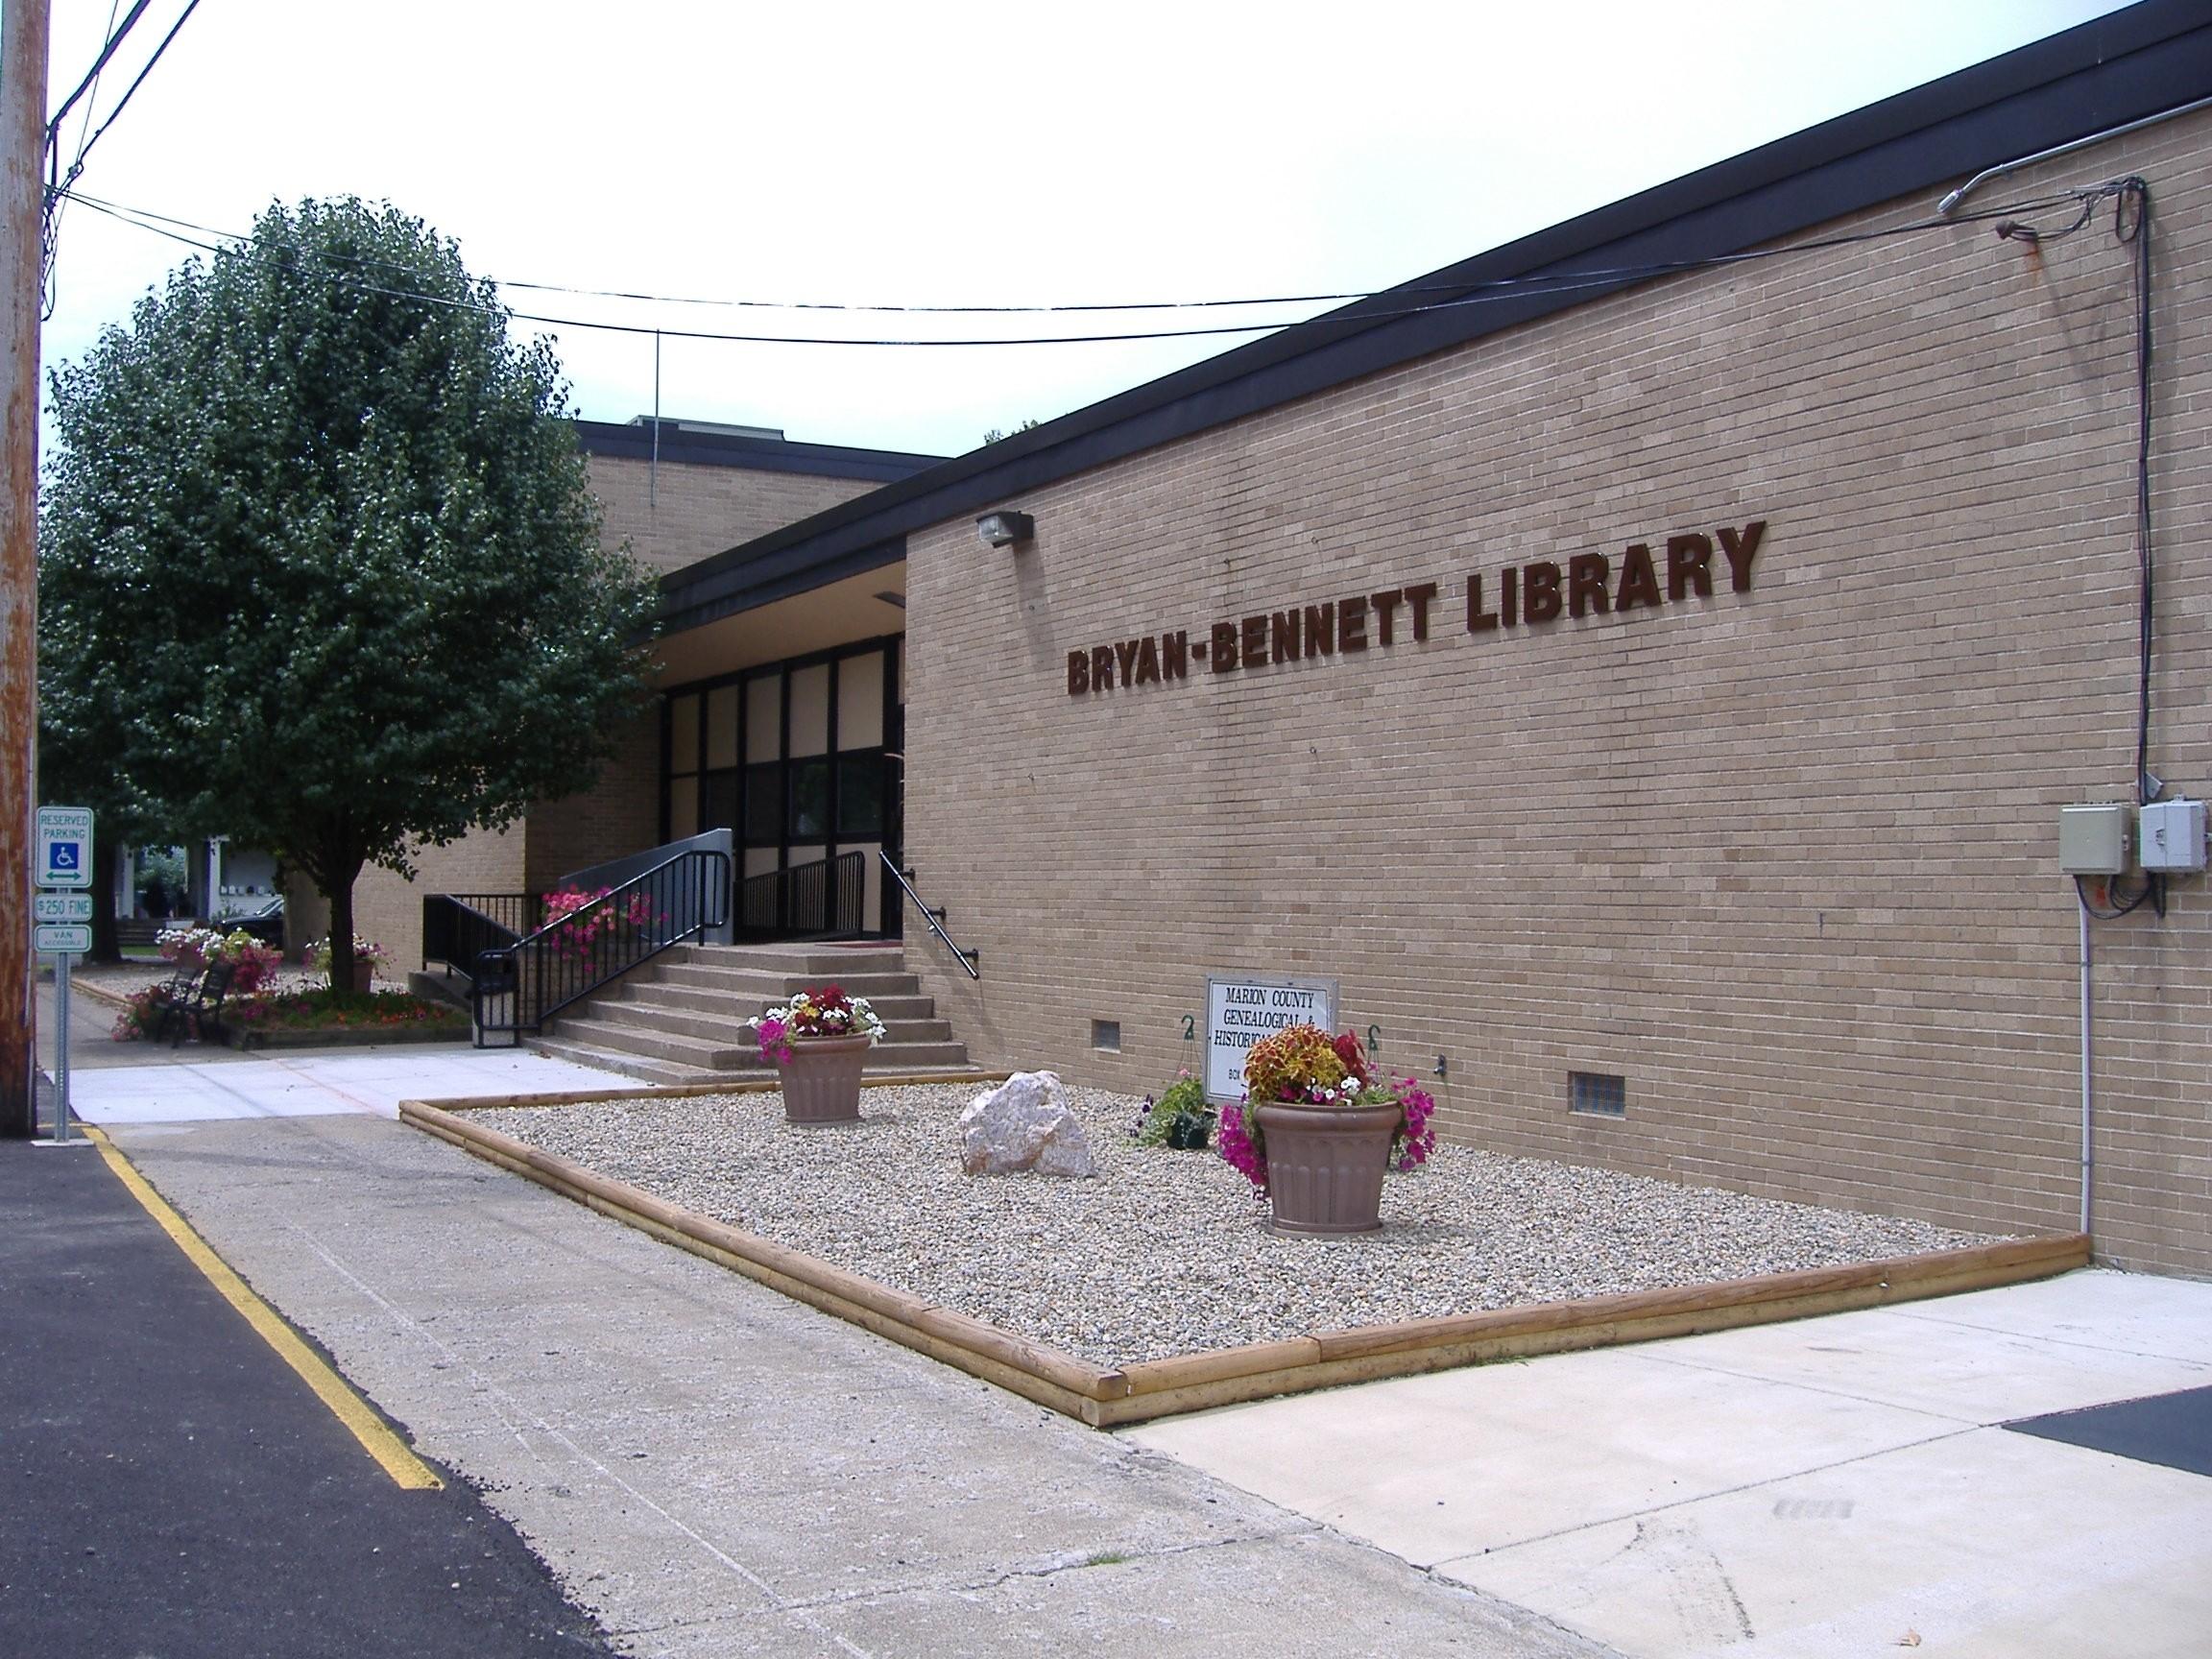 Bryan-Bennett Library Exterior